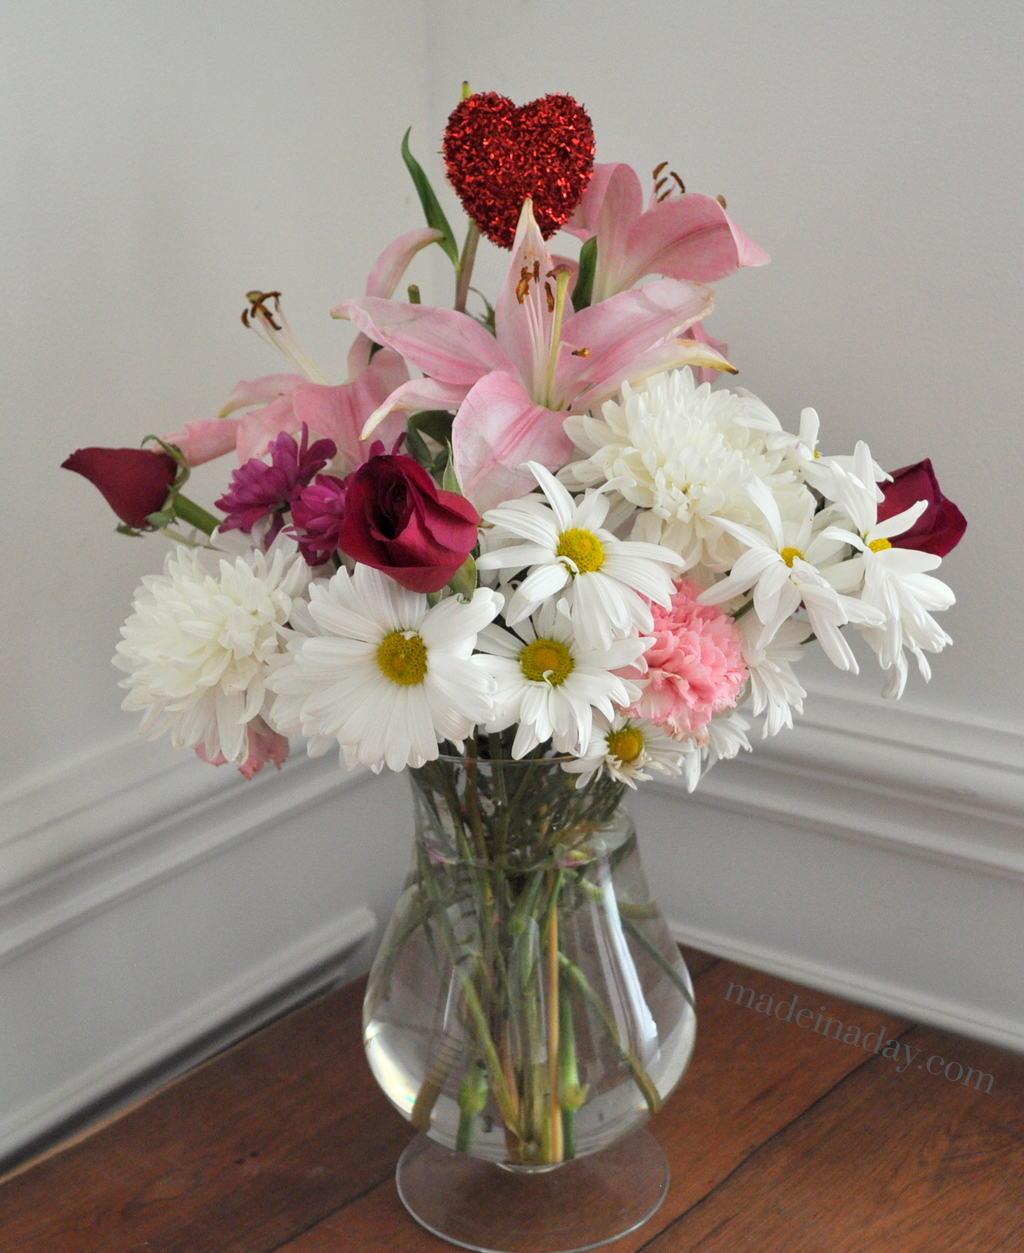 Wedding Flower Arrangements Pinterest: Floral Arrangements & Wedding